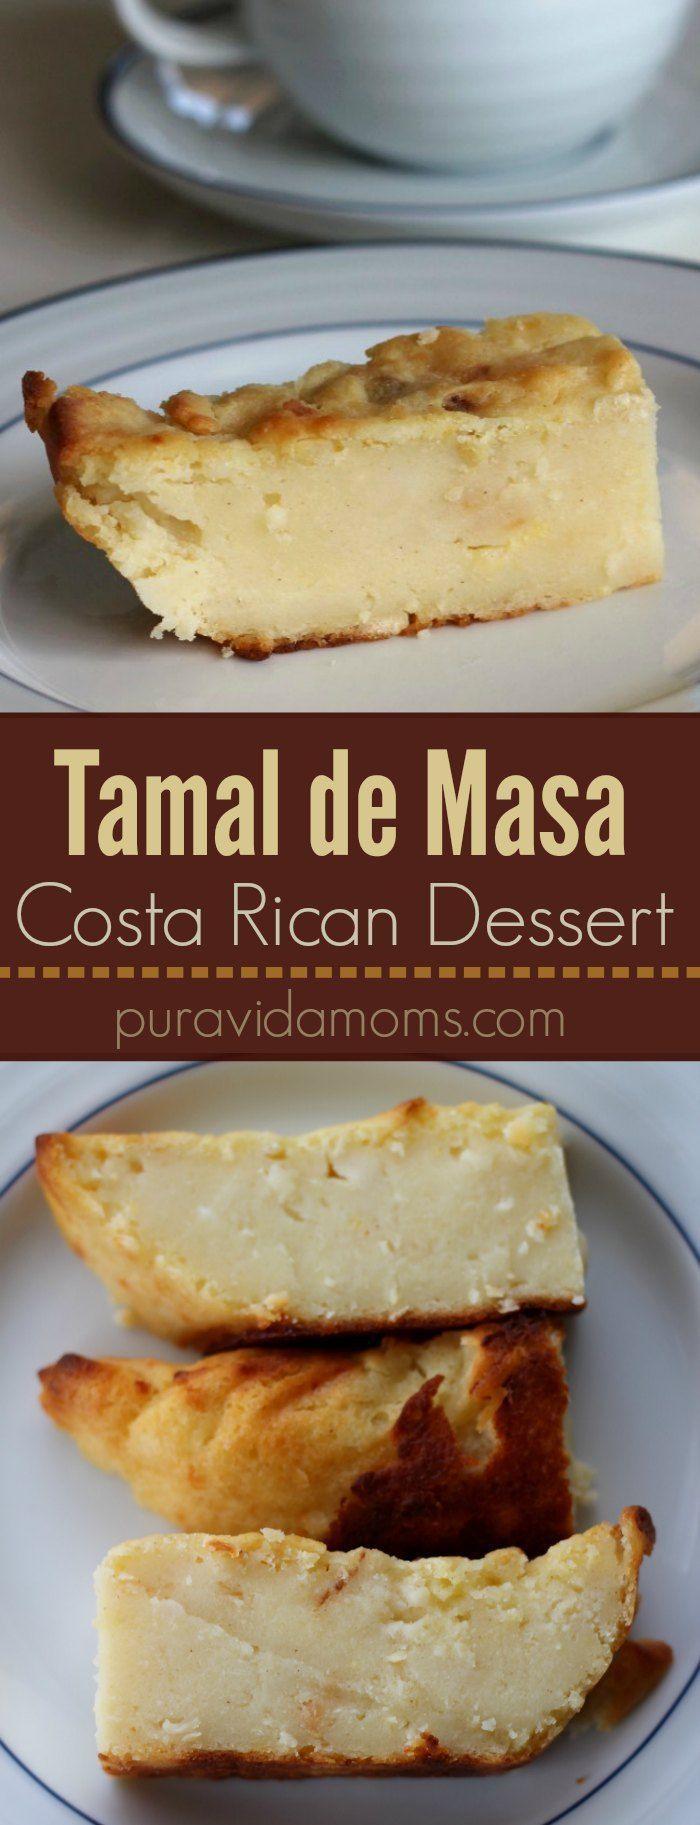 Tamal de masa costa rican dessert recipes pinterest costa tamal de masa costa rican dessert forumfinder Gallery